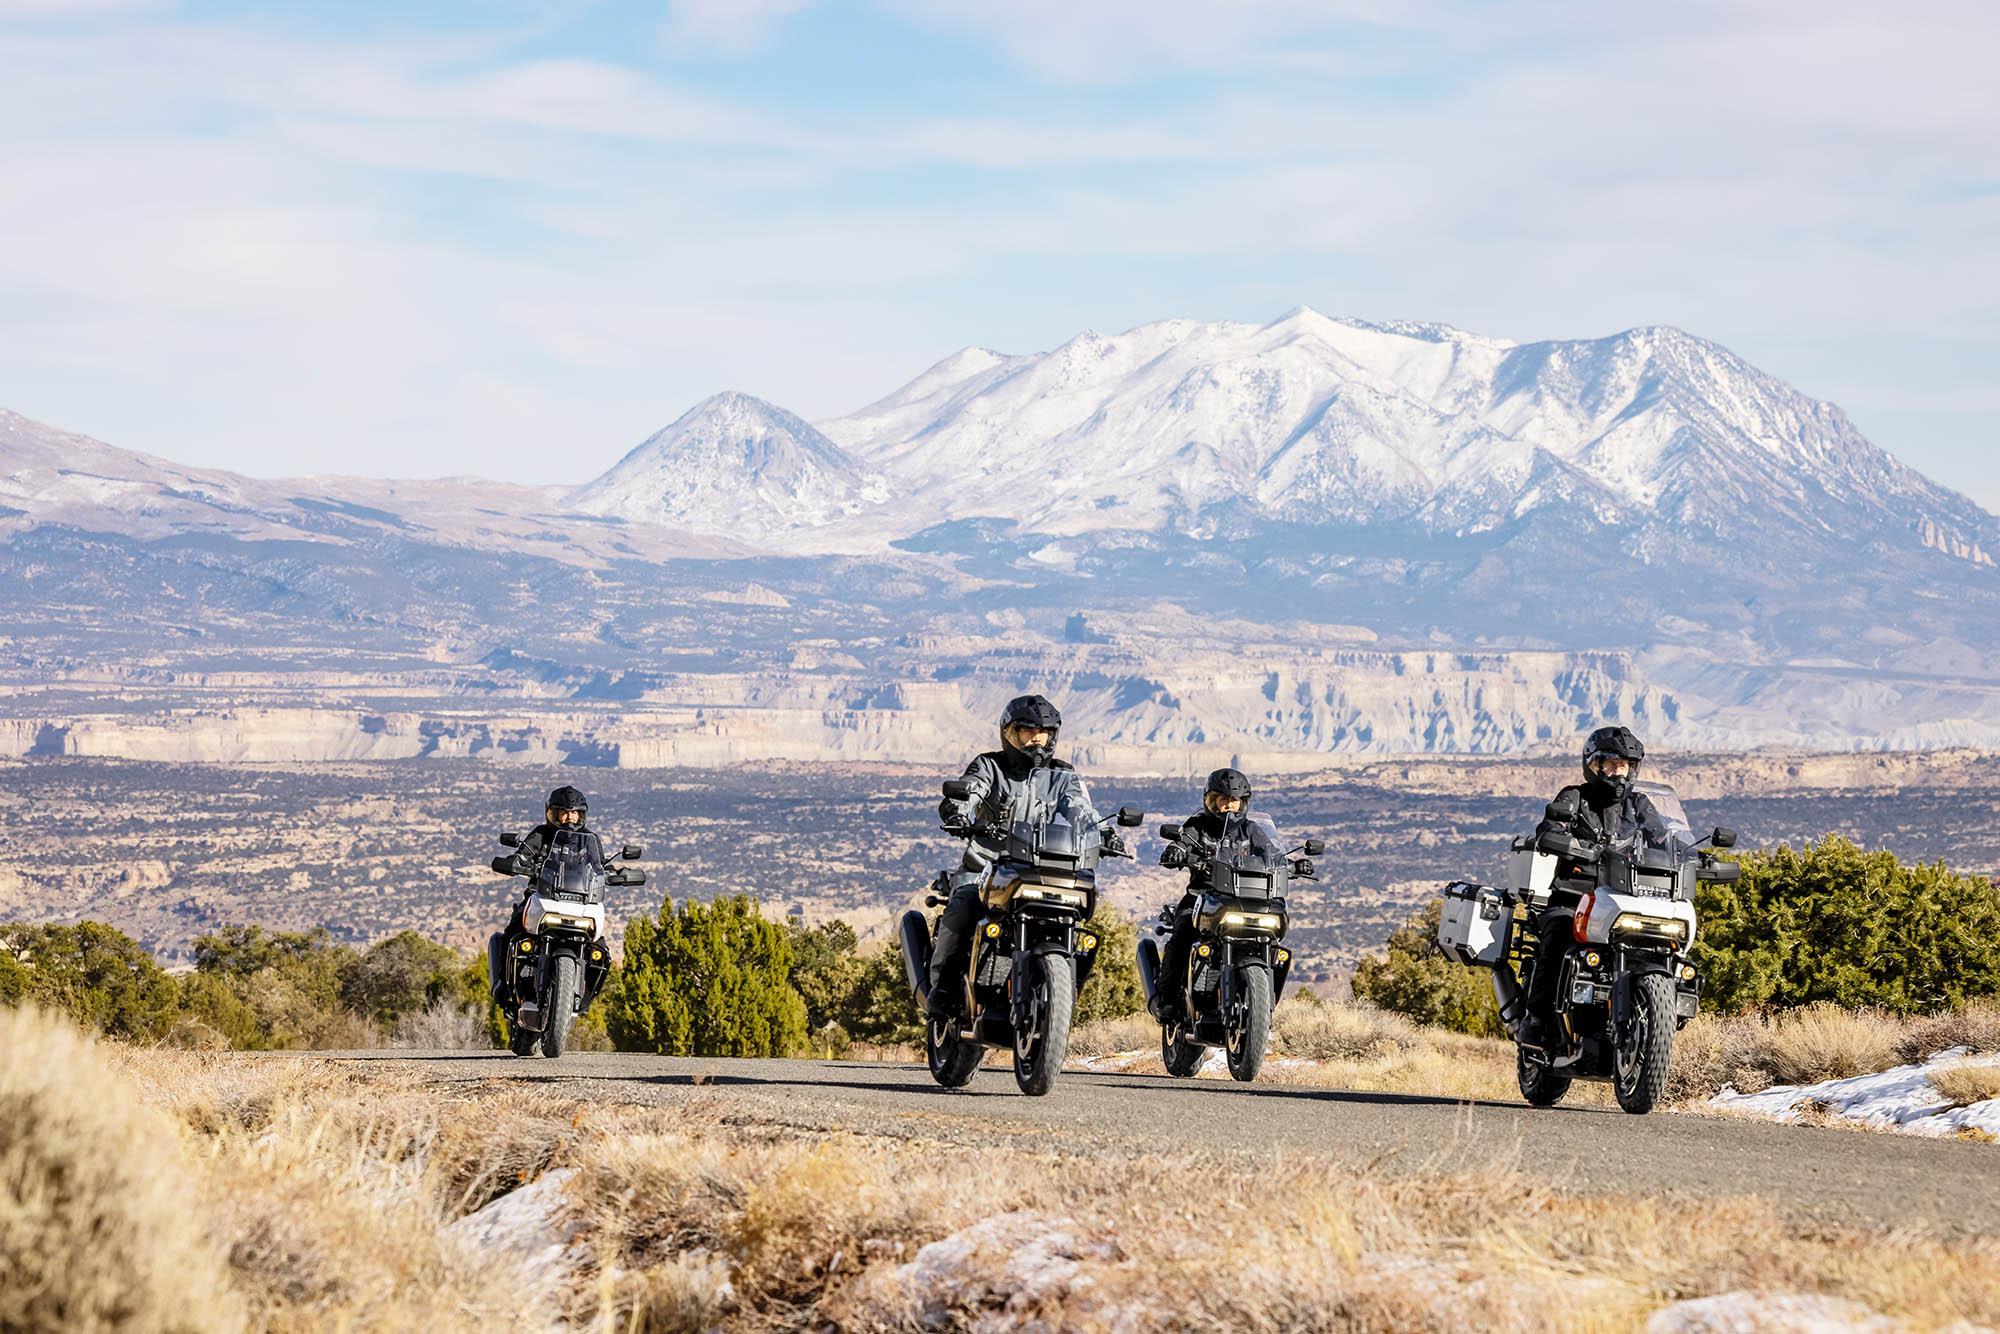 Harley Adventure bikes